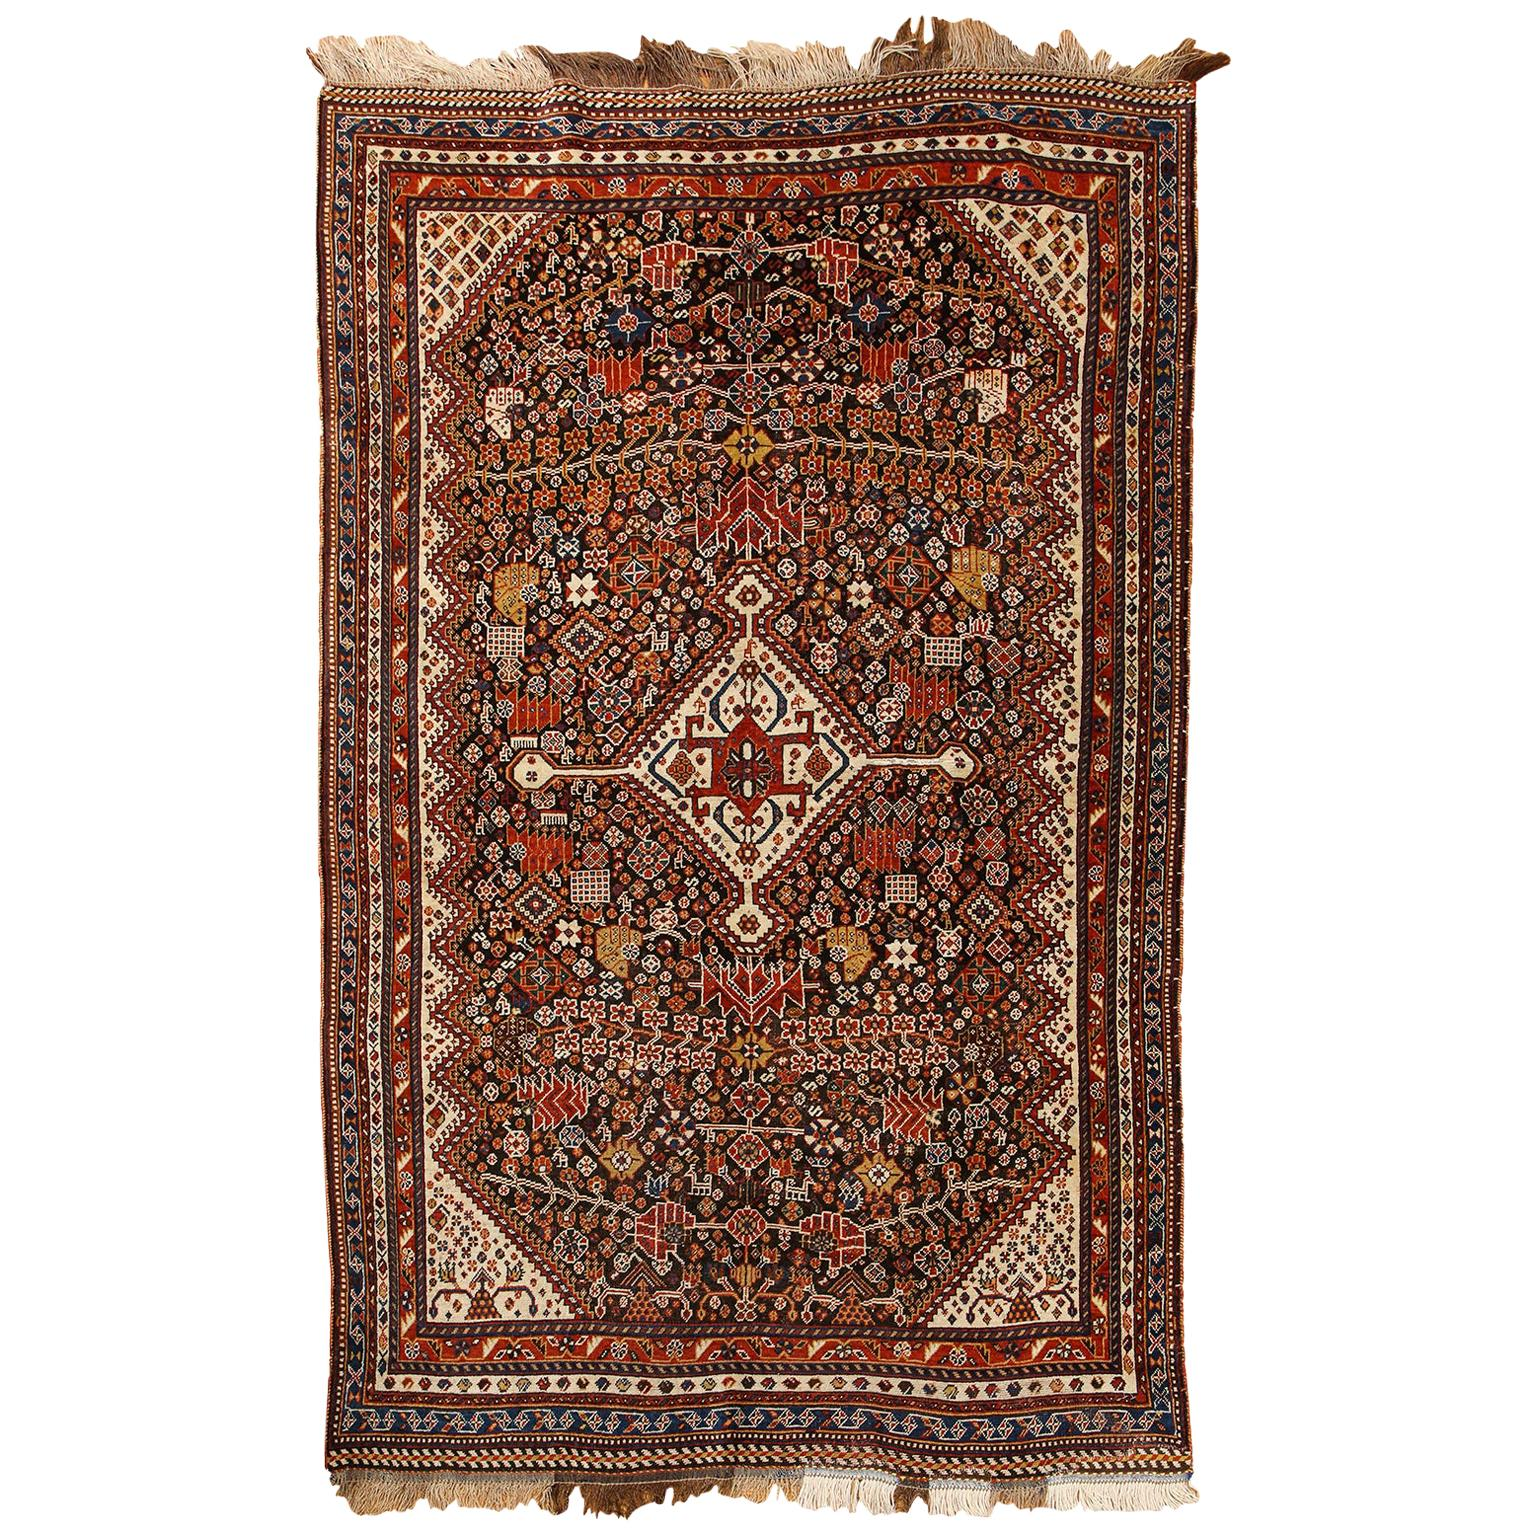 Antique Persian Qashqai Kashkooli Carpet in Pure Wool and Vegetal Dyes